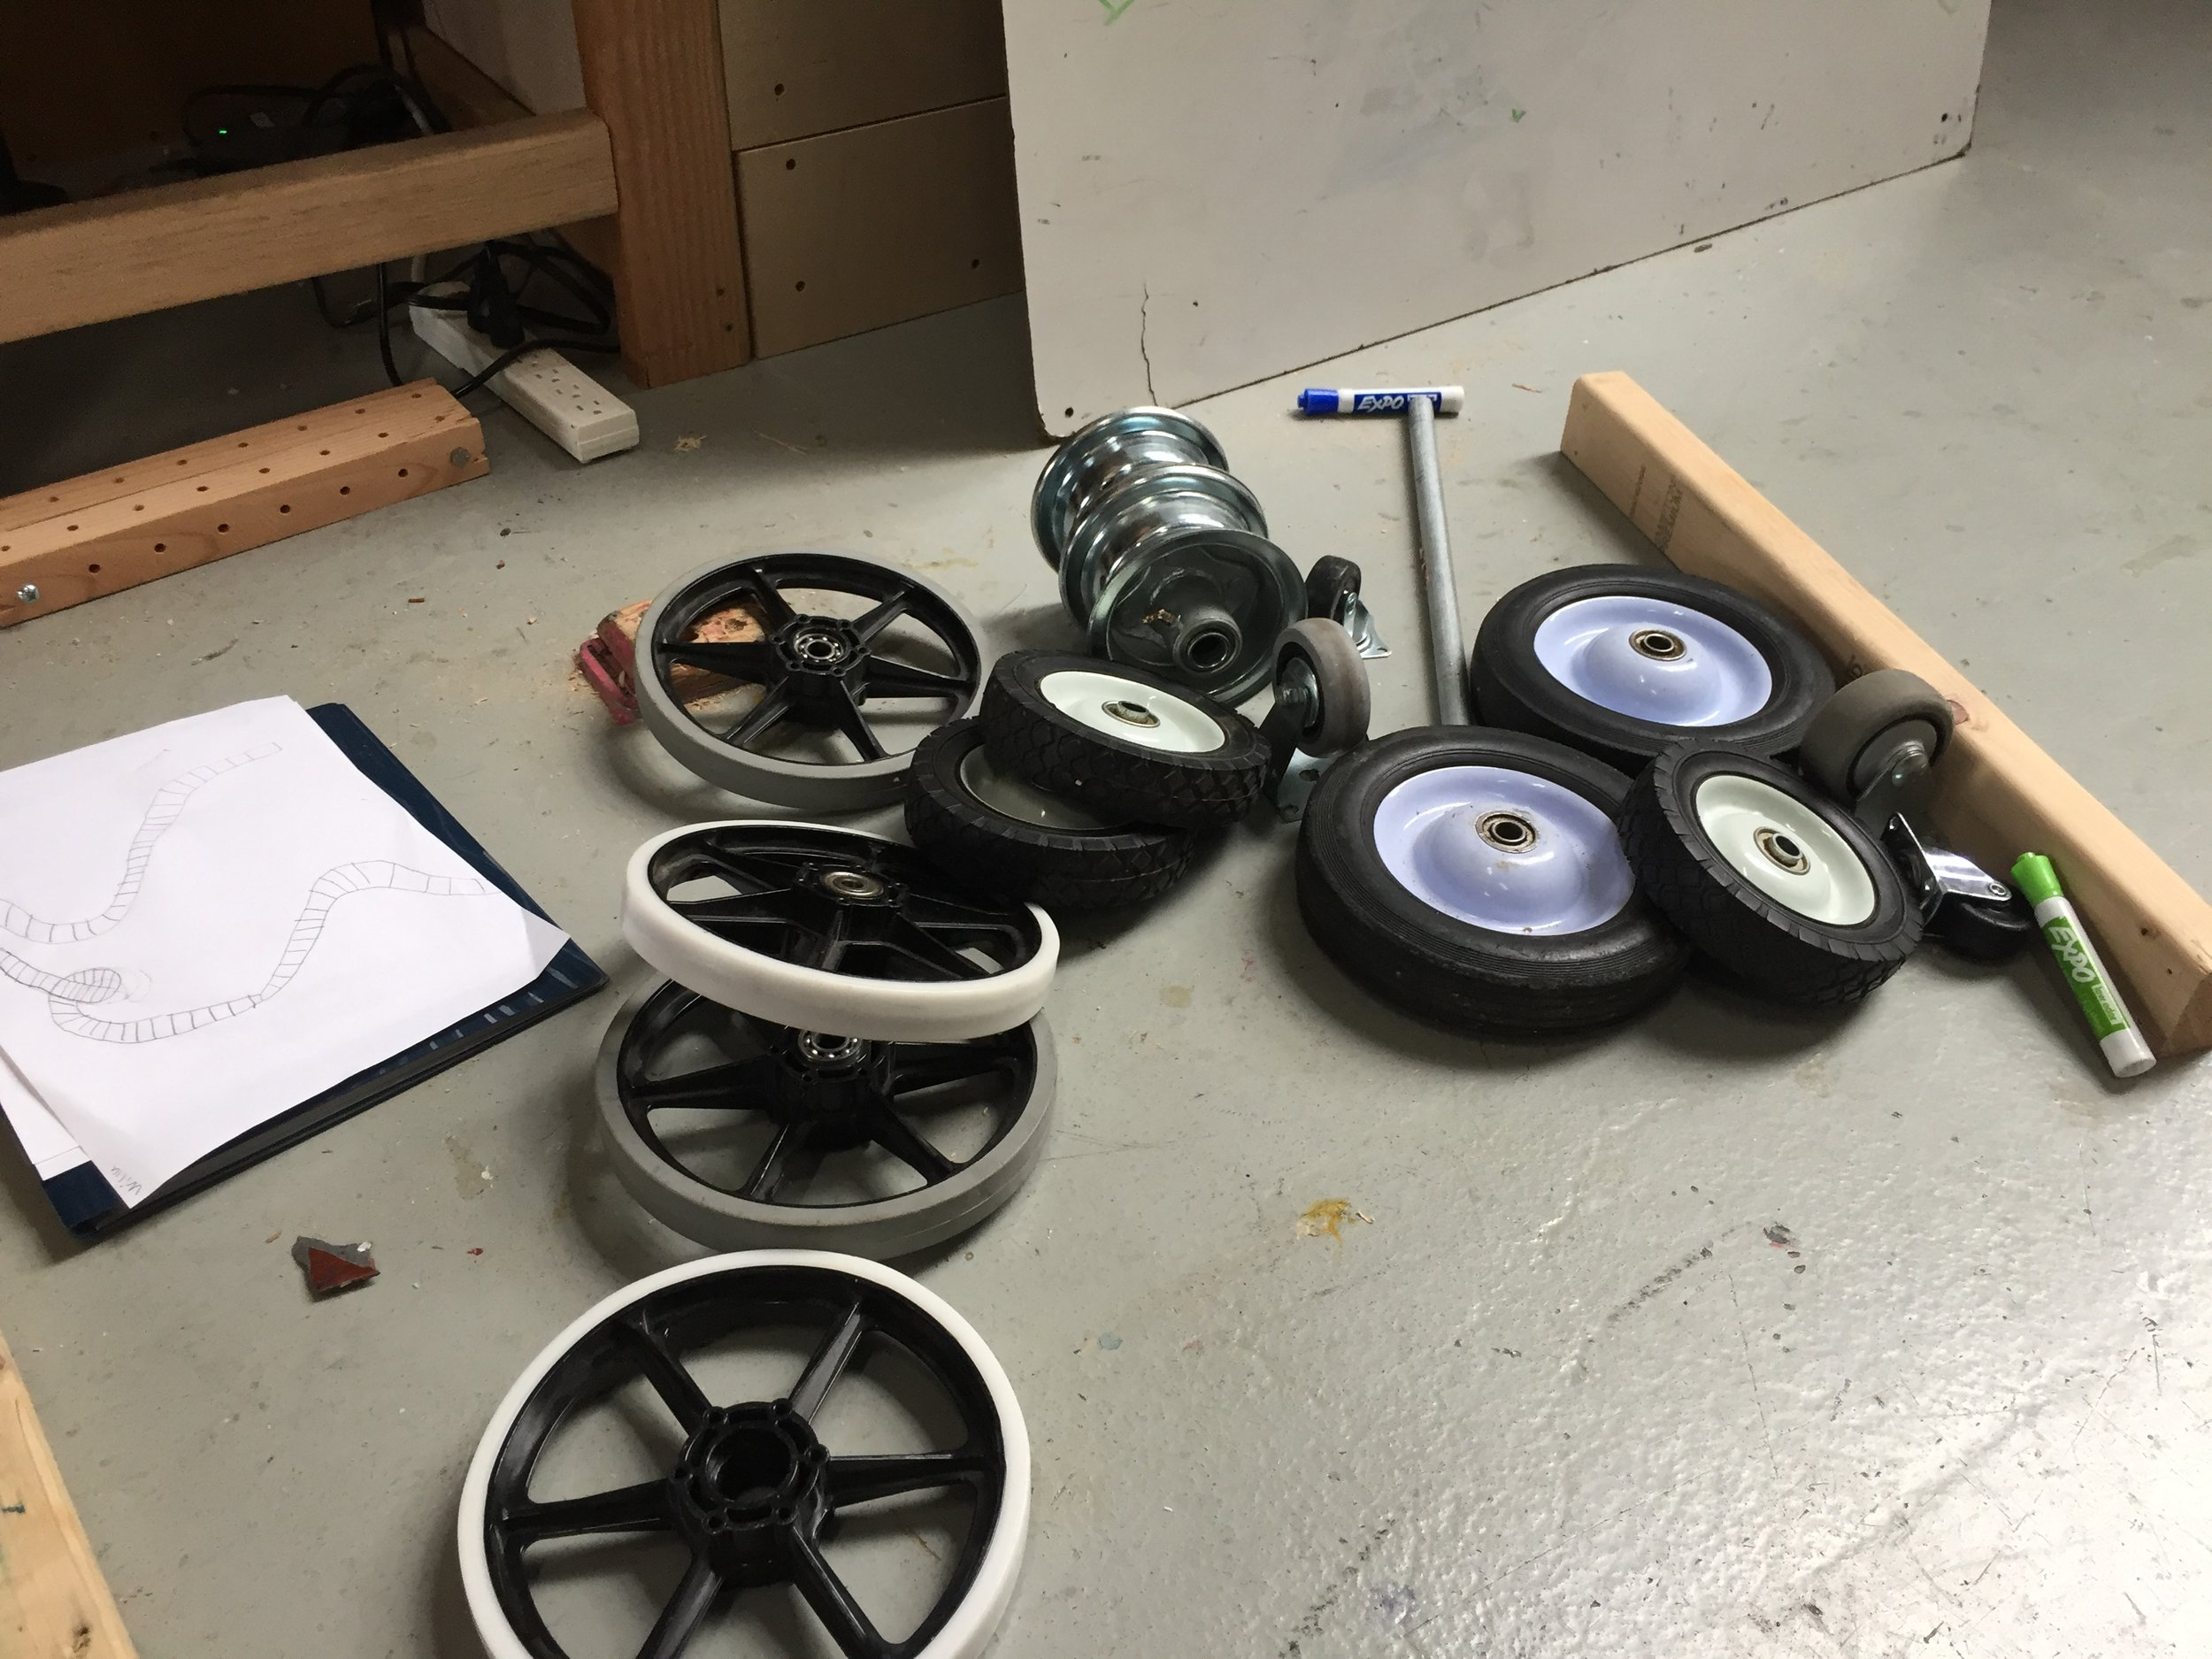 The wheel challenge!